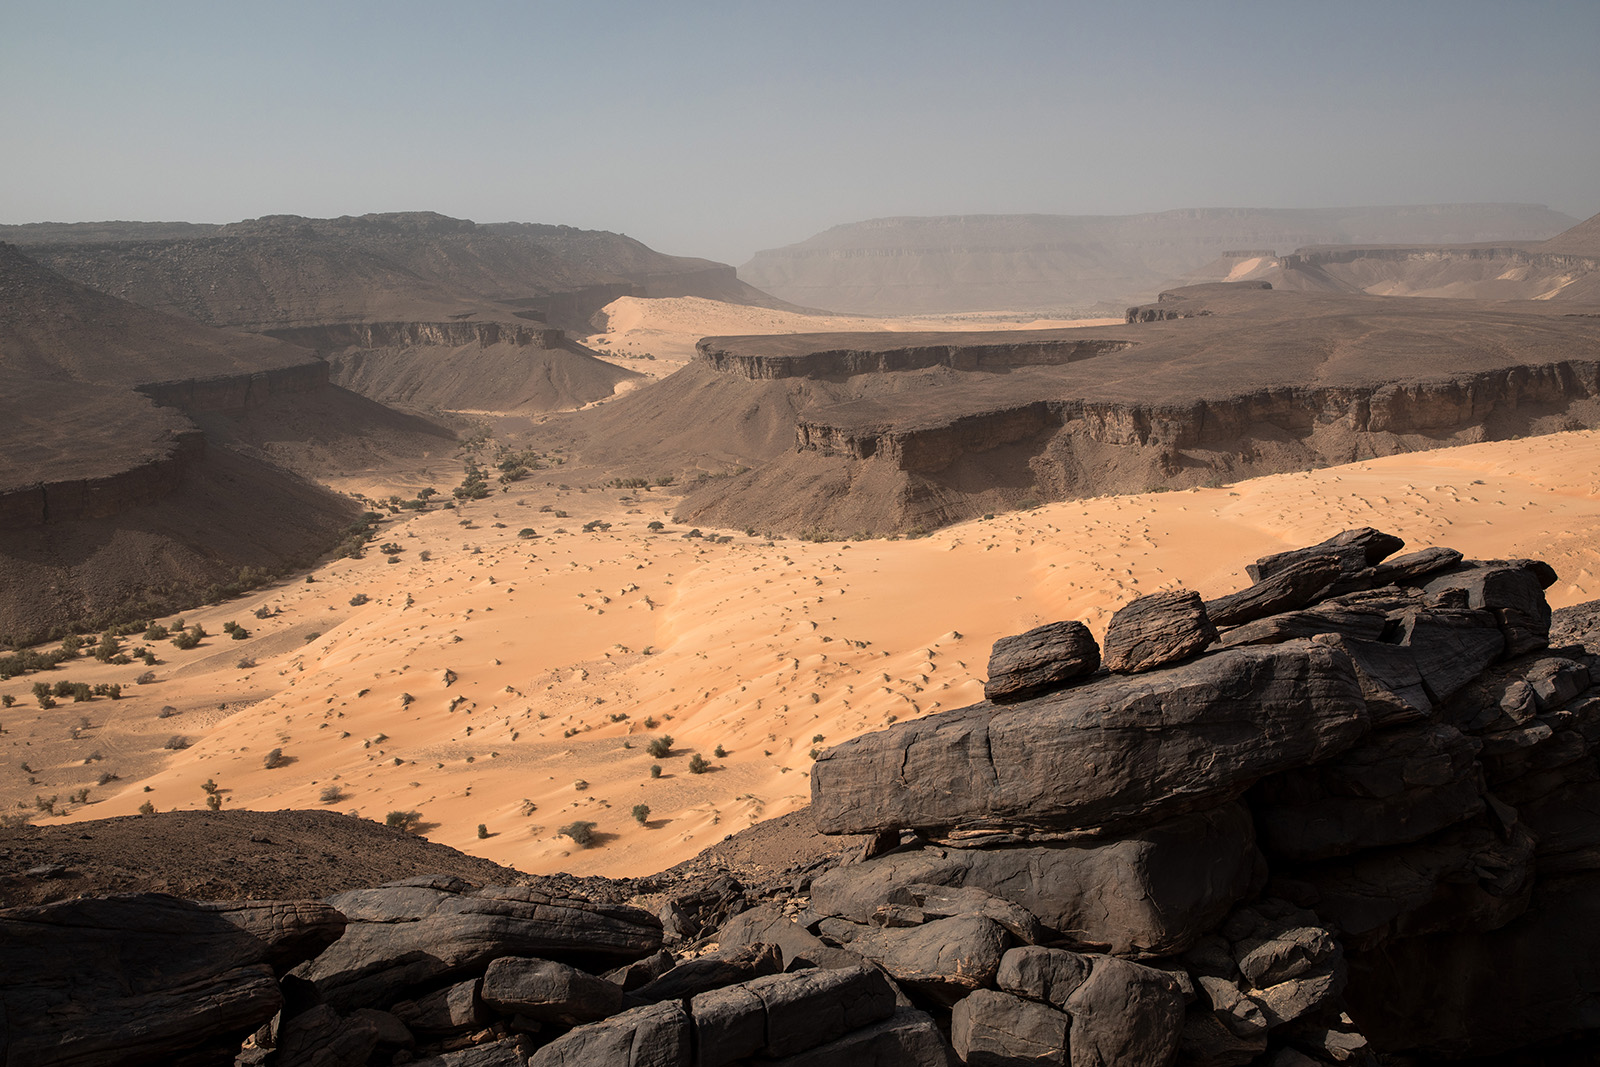 Canyon Mauritanie